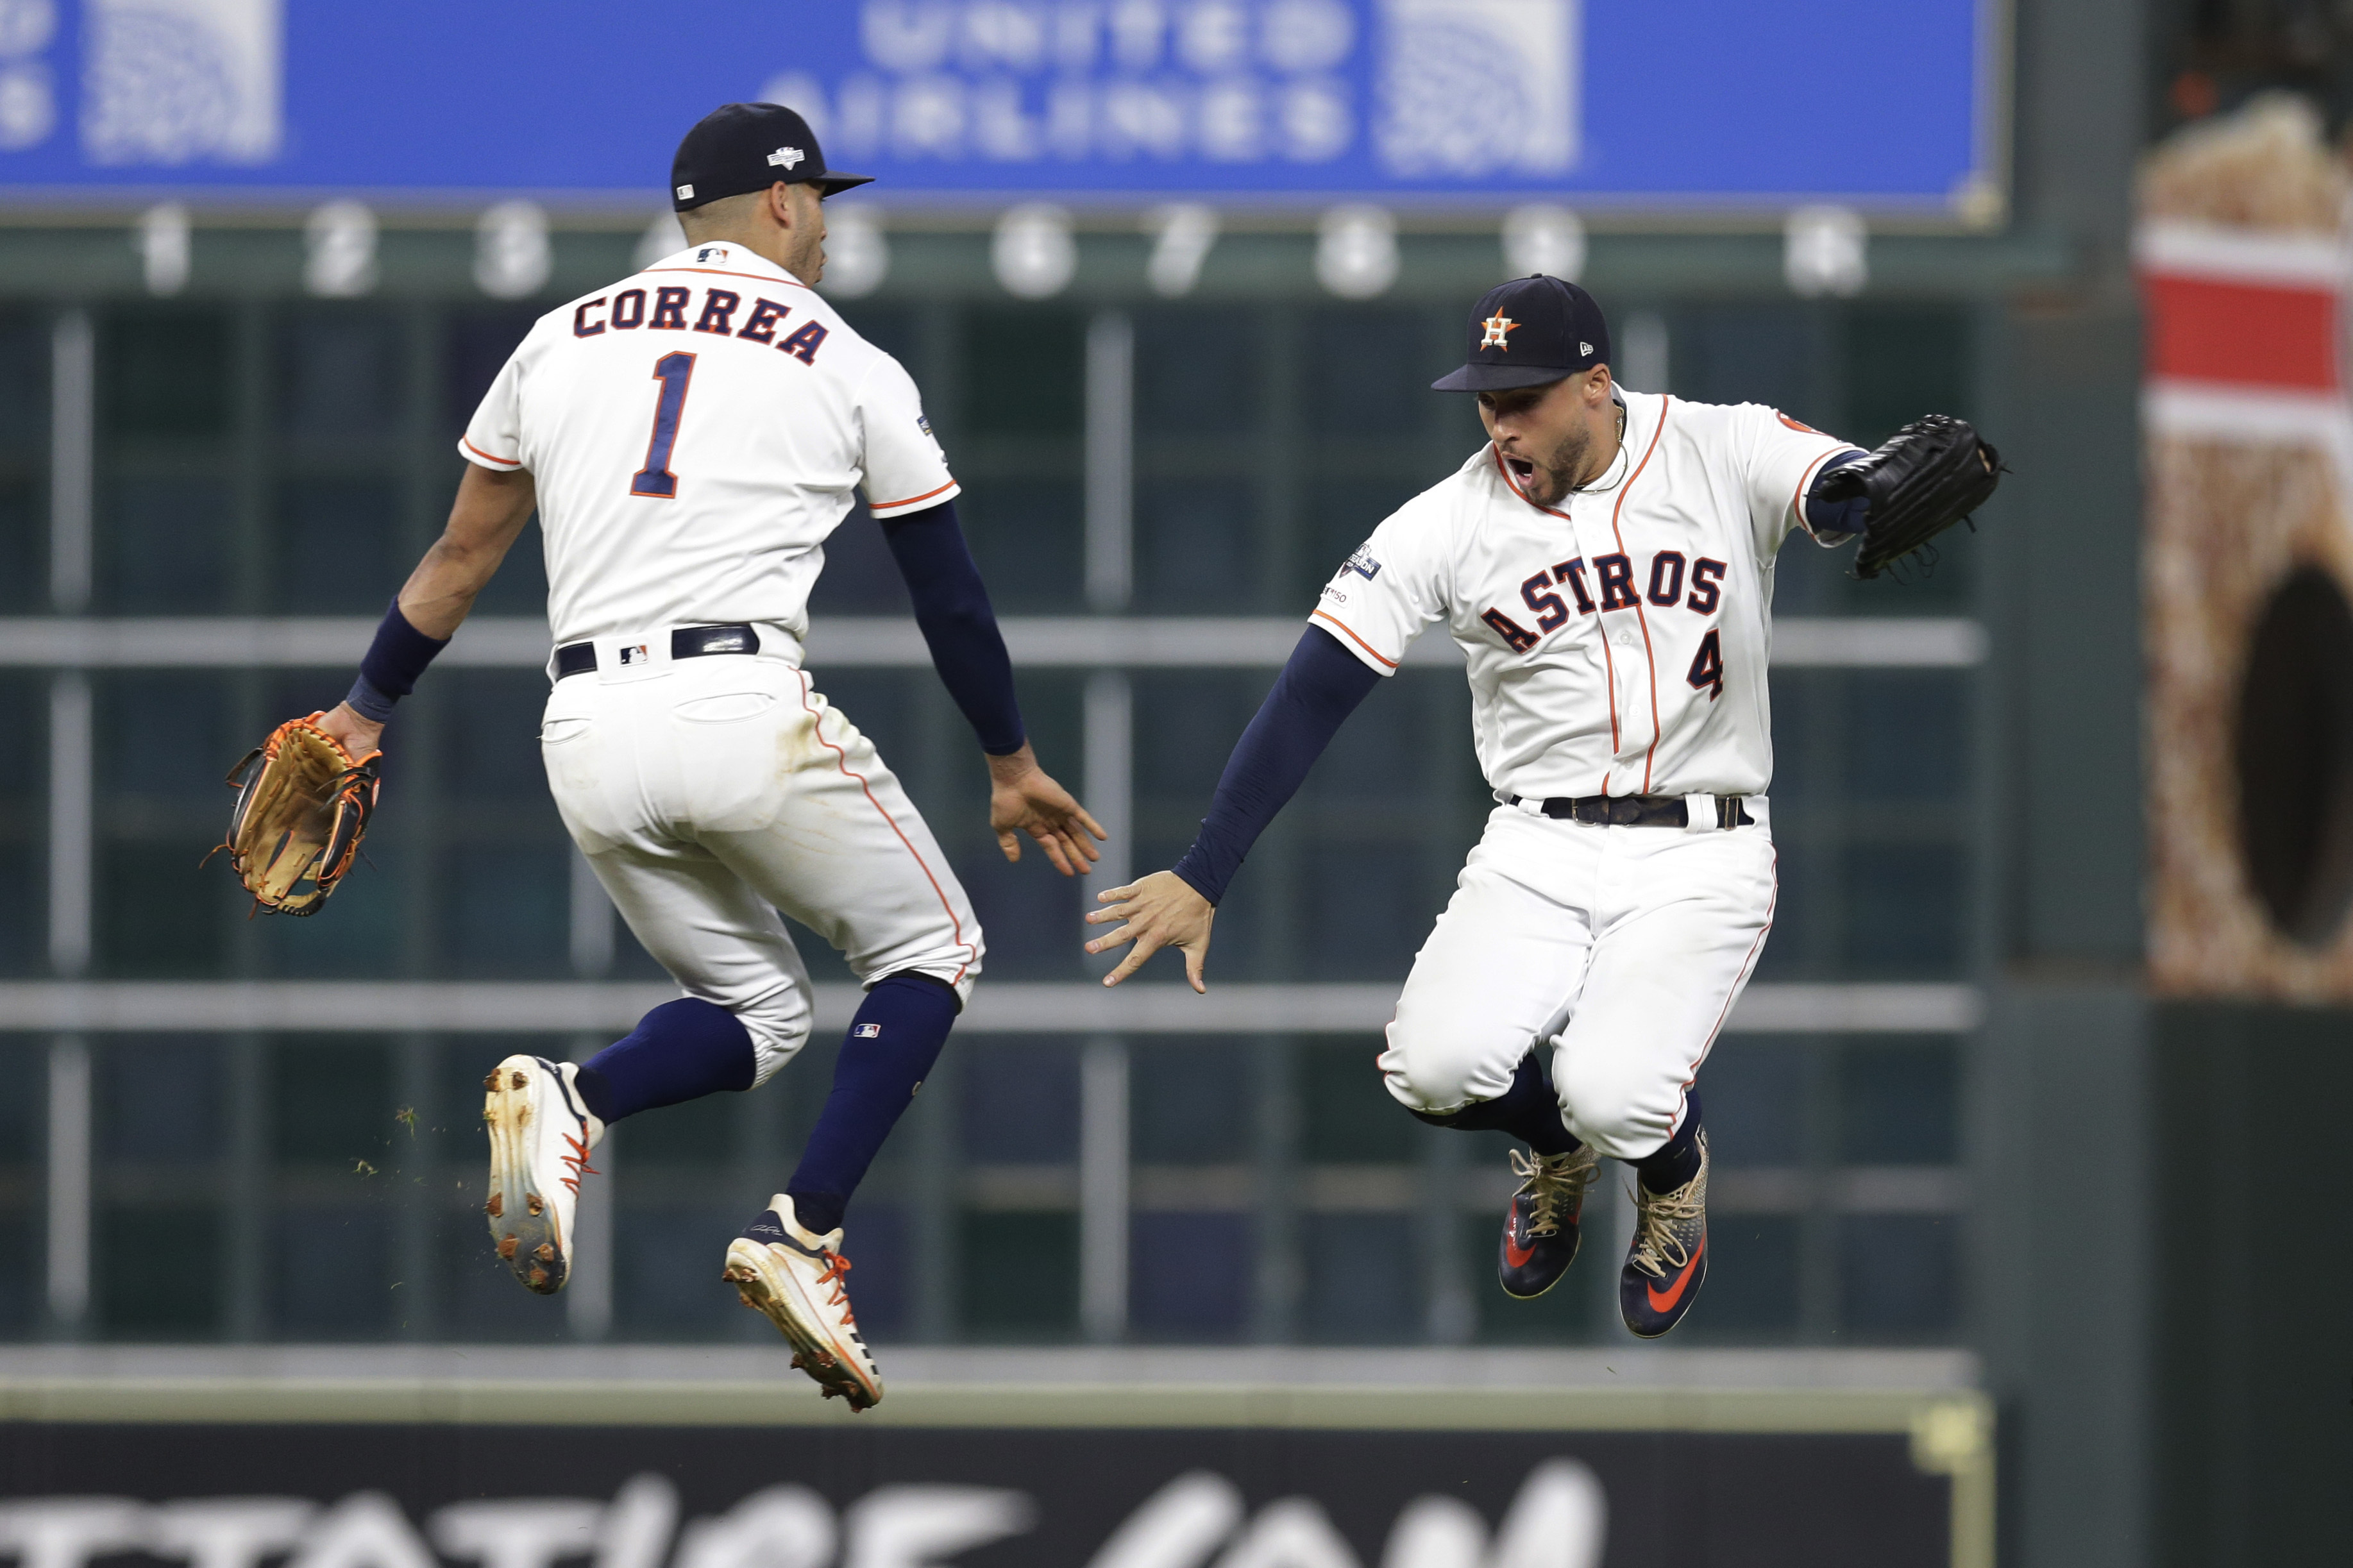 26+ Astros Rays Game 5 Pics